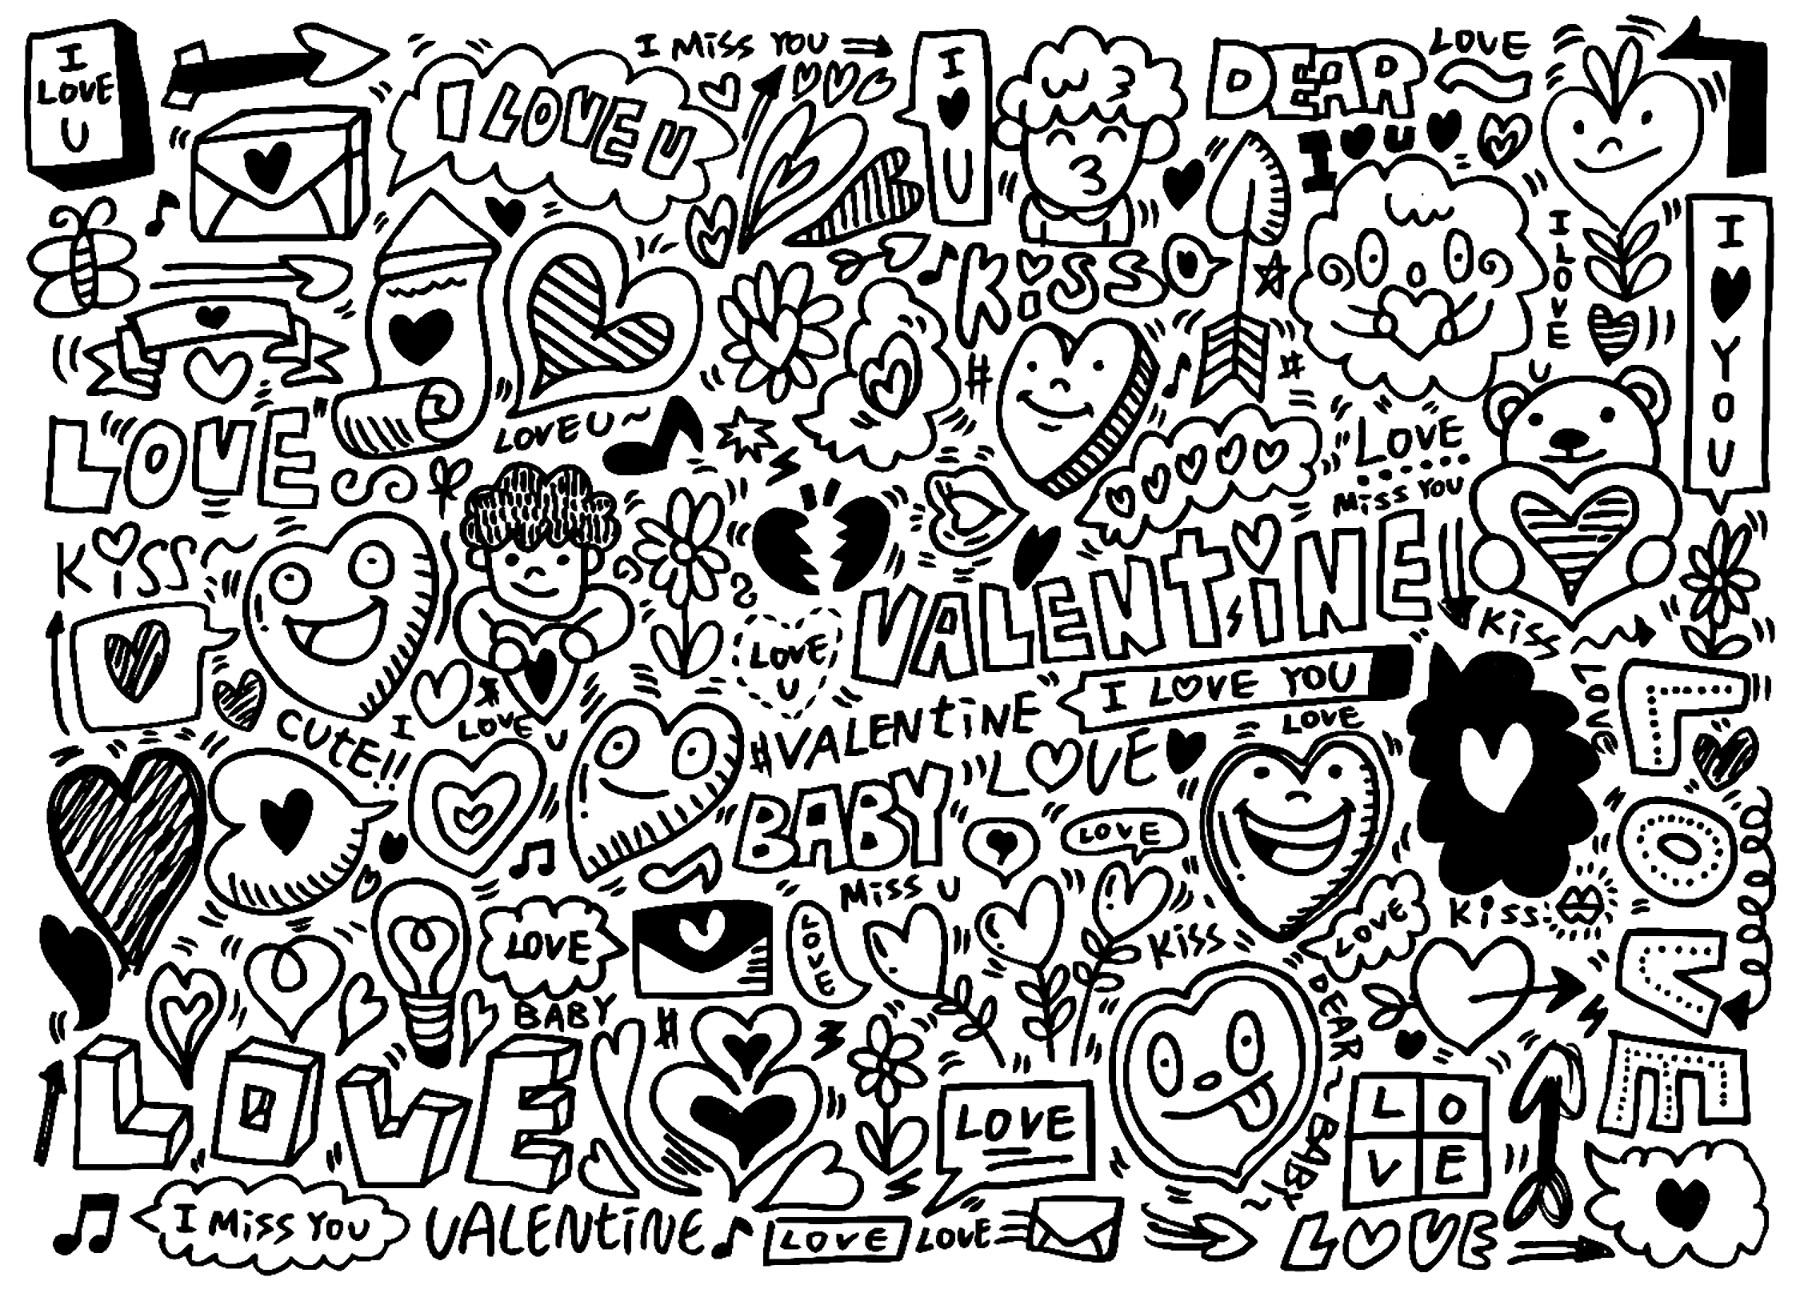 Doodle art doodling 28220